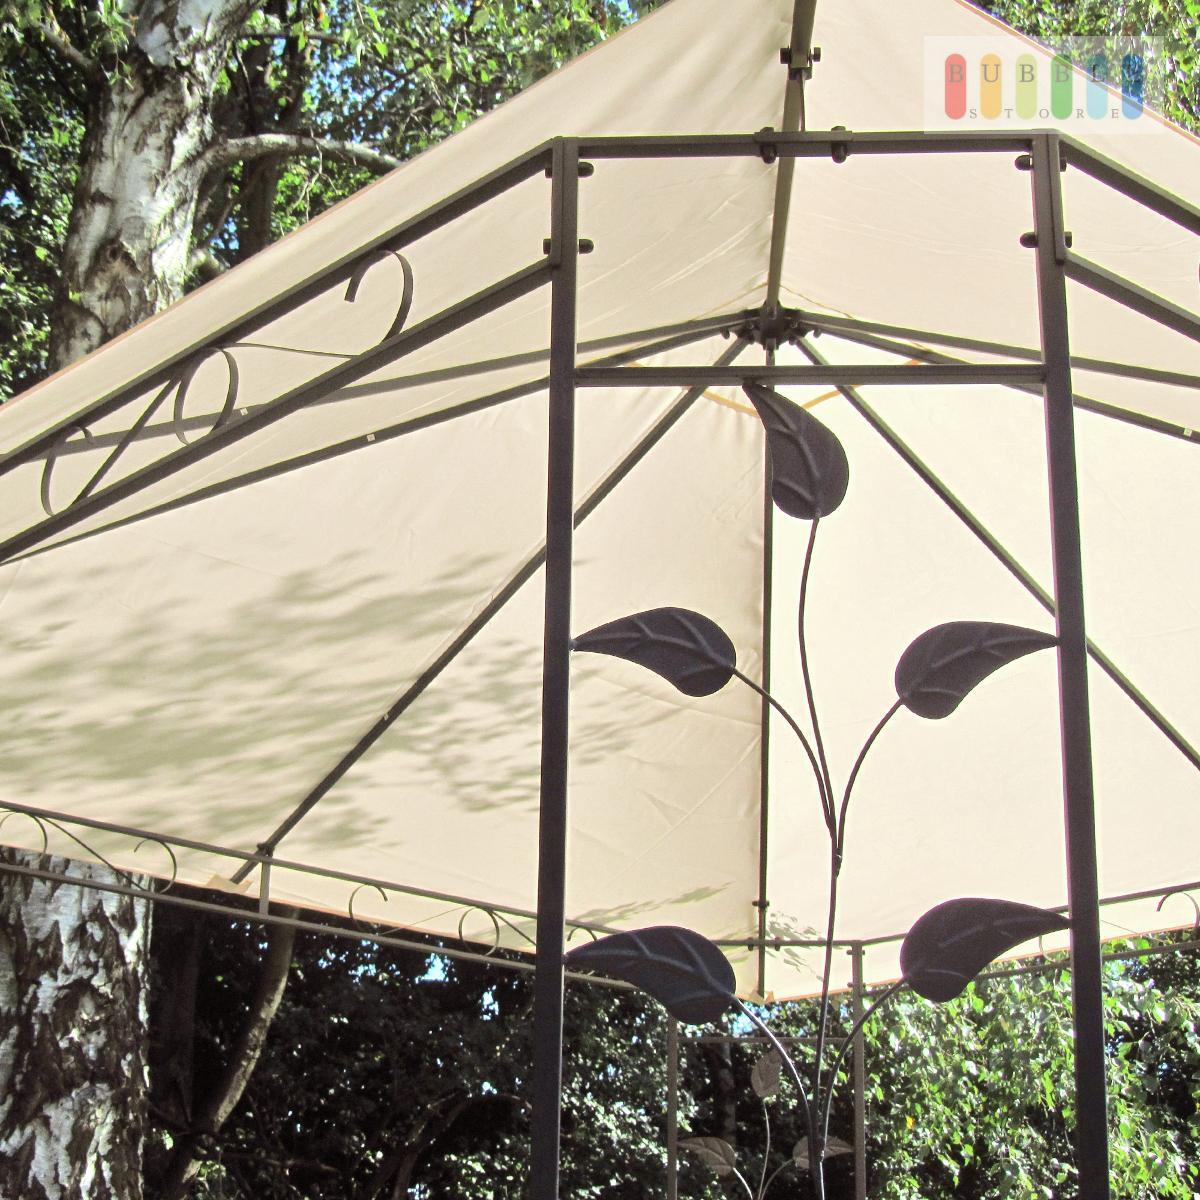 3x3m metallpavillon metall zelt pavillon gartenpavillon partyzelt blattdesign ebay. Black Bedroom Furniture Sets. Home Design Ideas